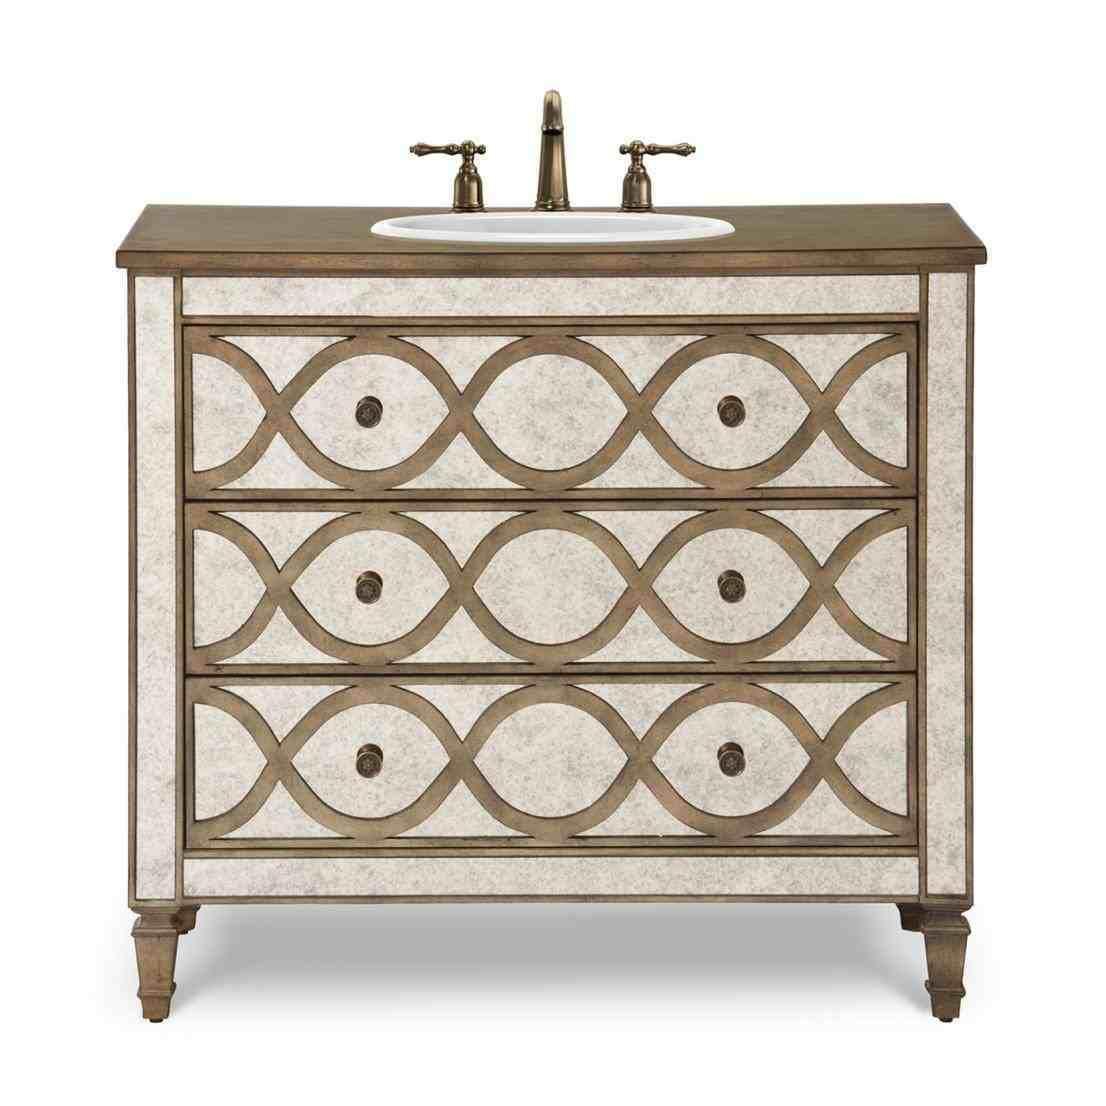 New Post 40 Inch Bathroom Vanities  Livingrooms  Pinterest Fair 40 Inch Bathroom Vanity Review